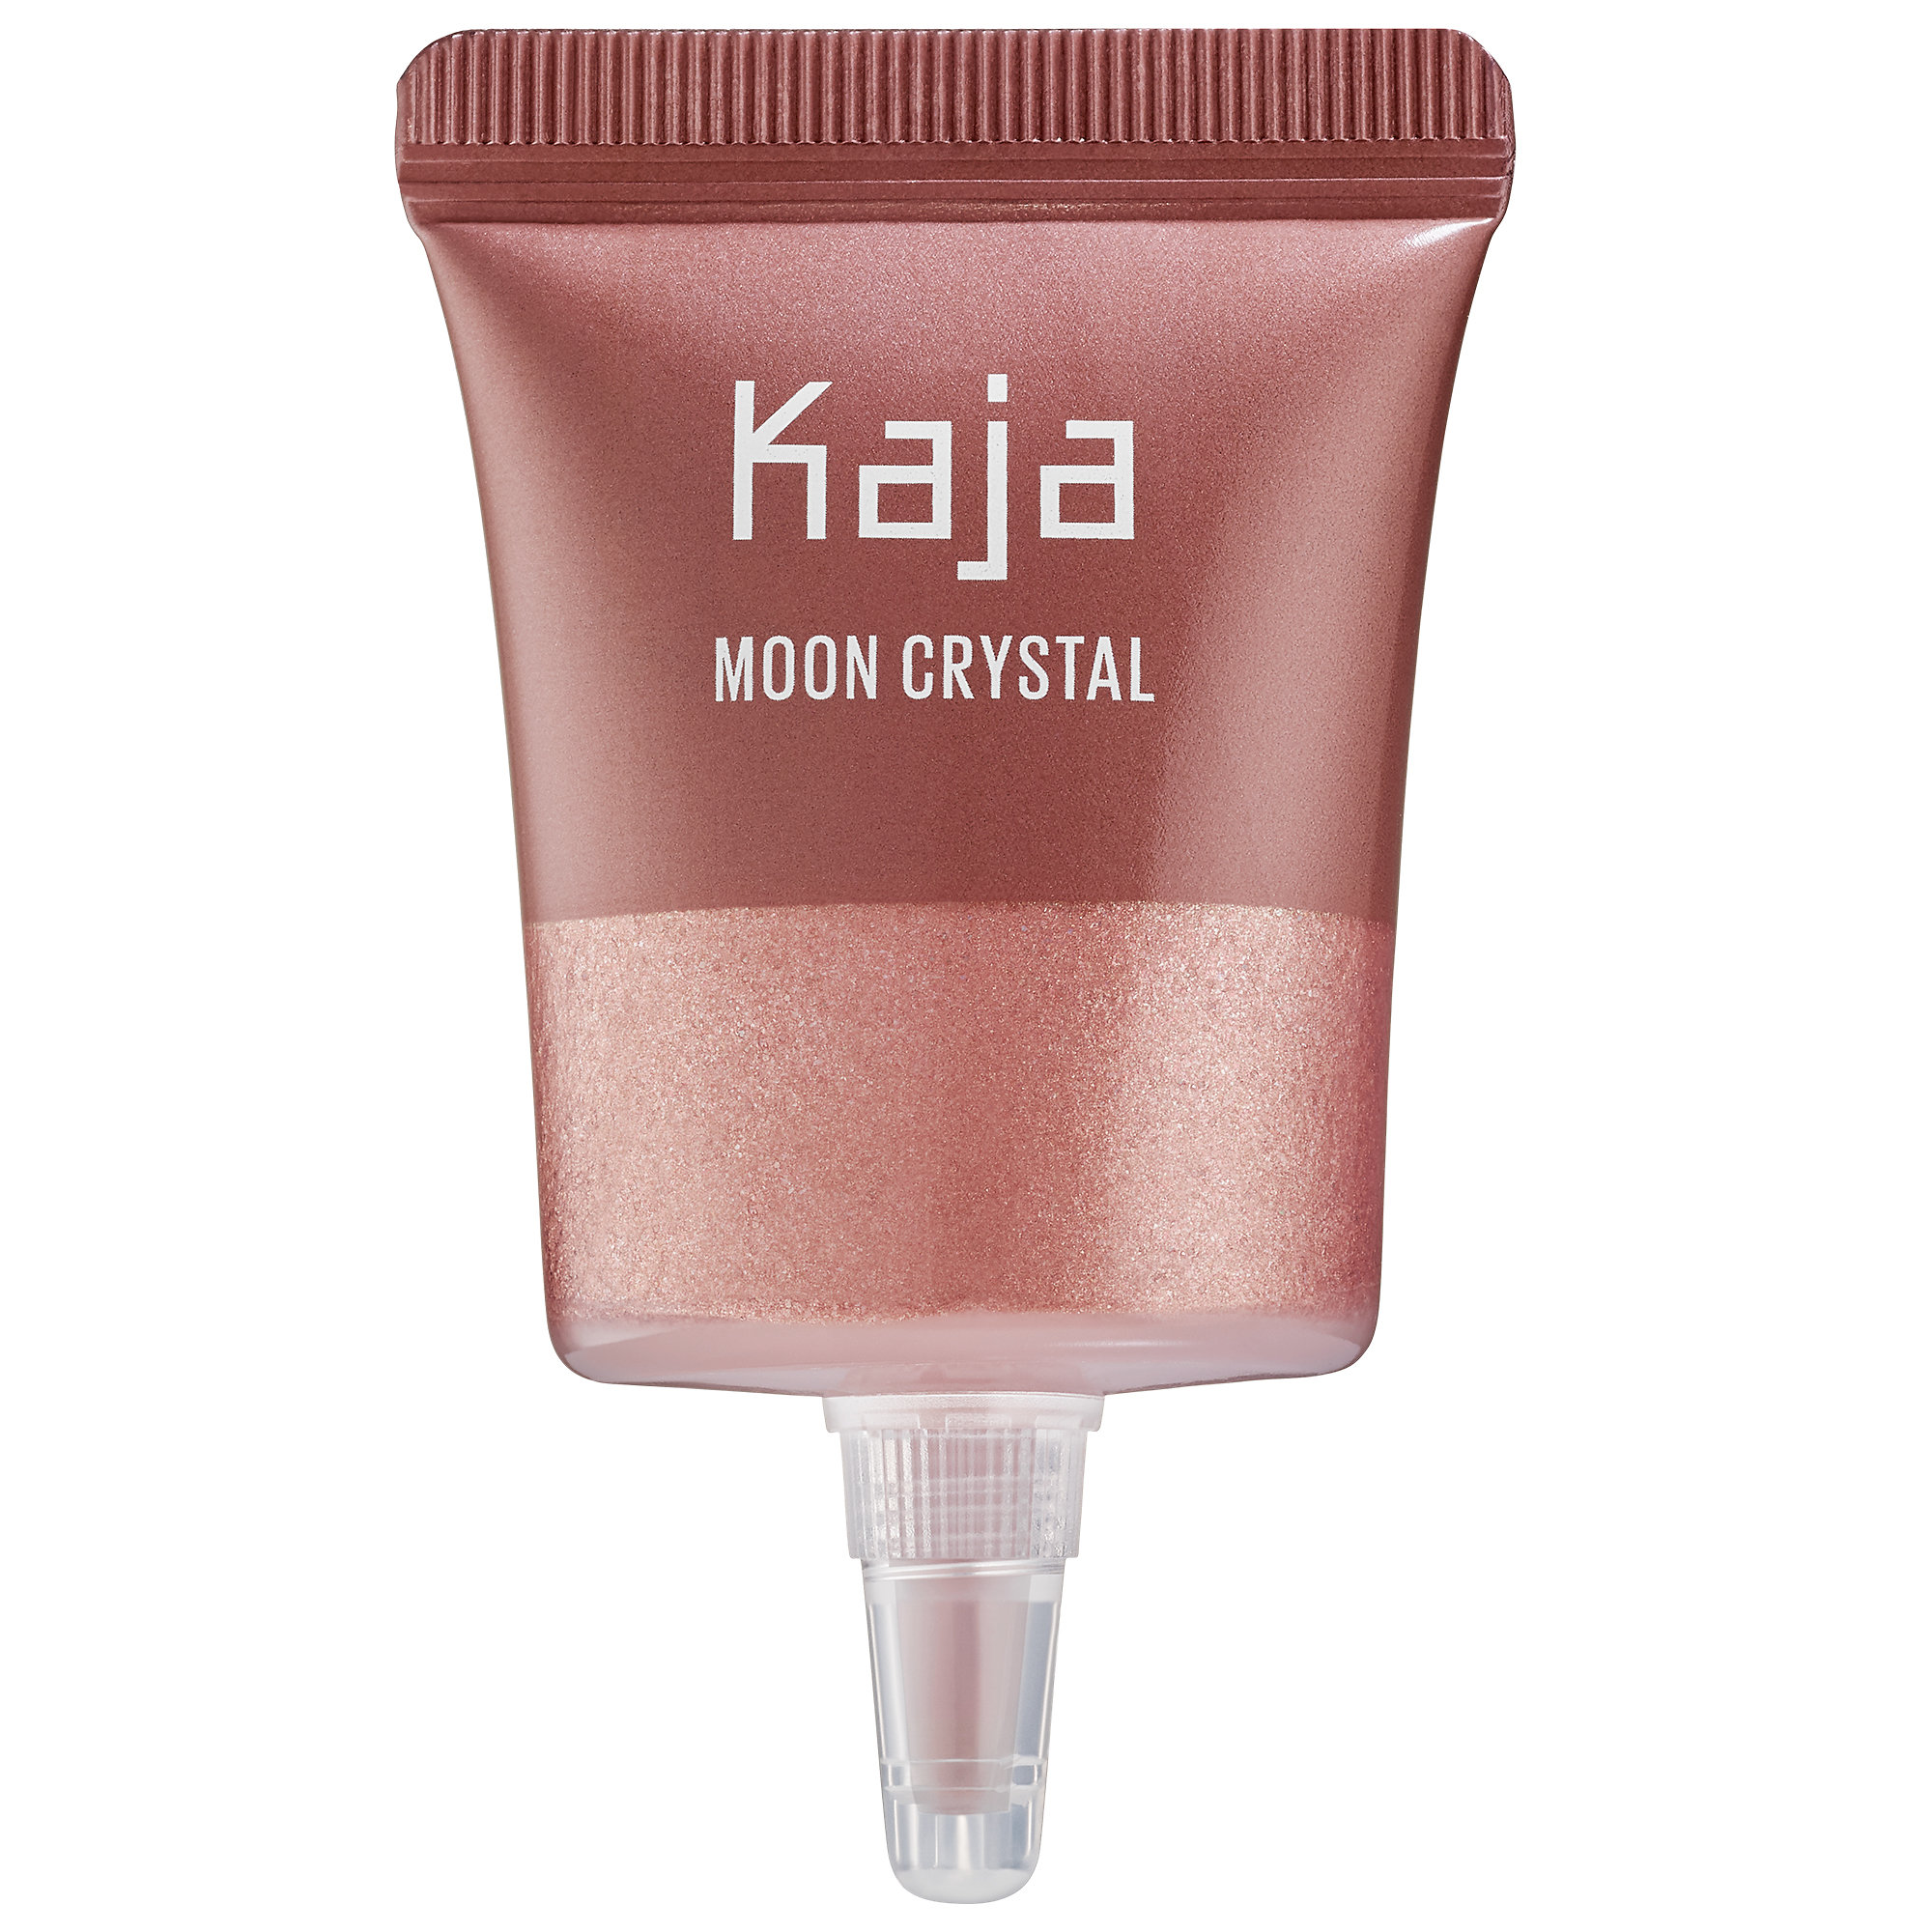 Kaja - Moon Crystal Sparkling Eye Pigment